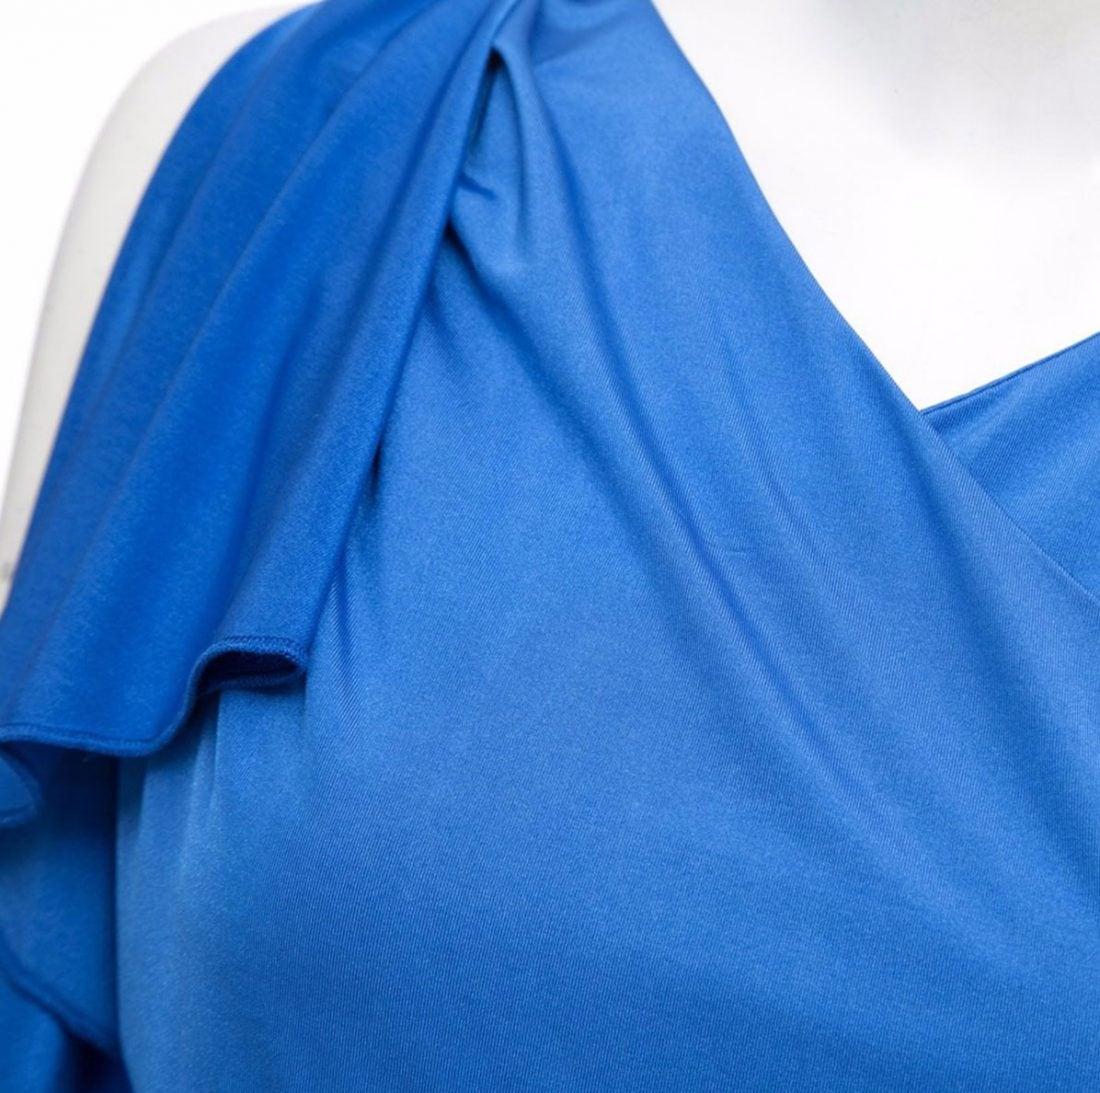 M0188 blue4 Short Sleeve Dresses maureens.com boutique